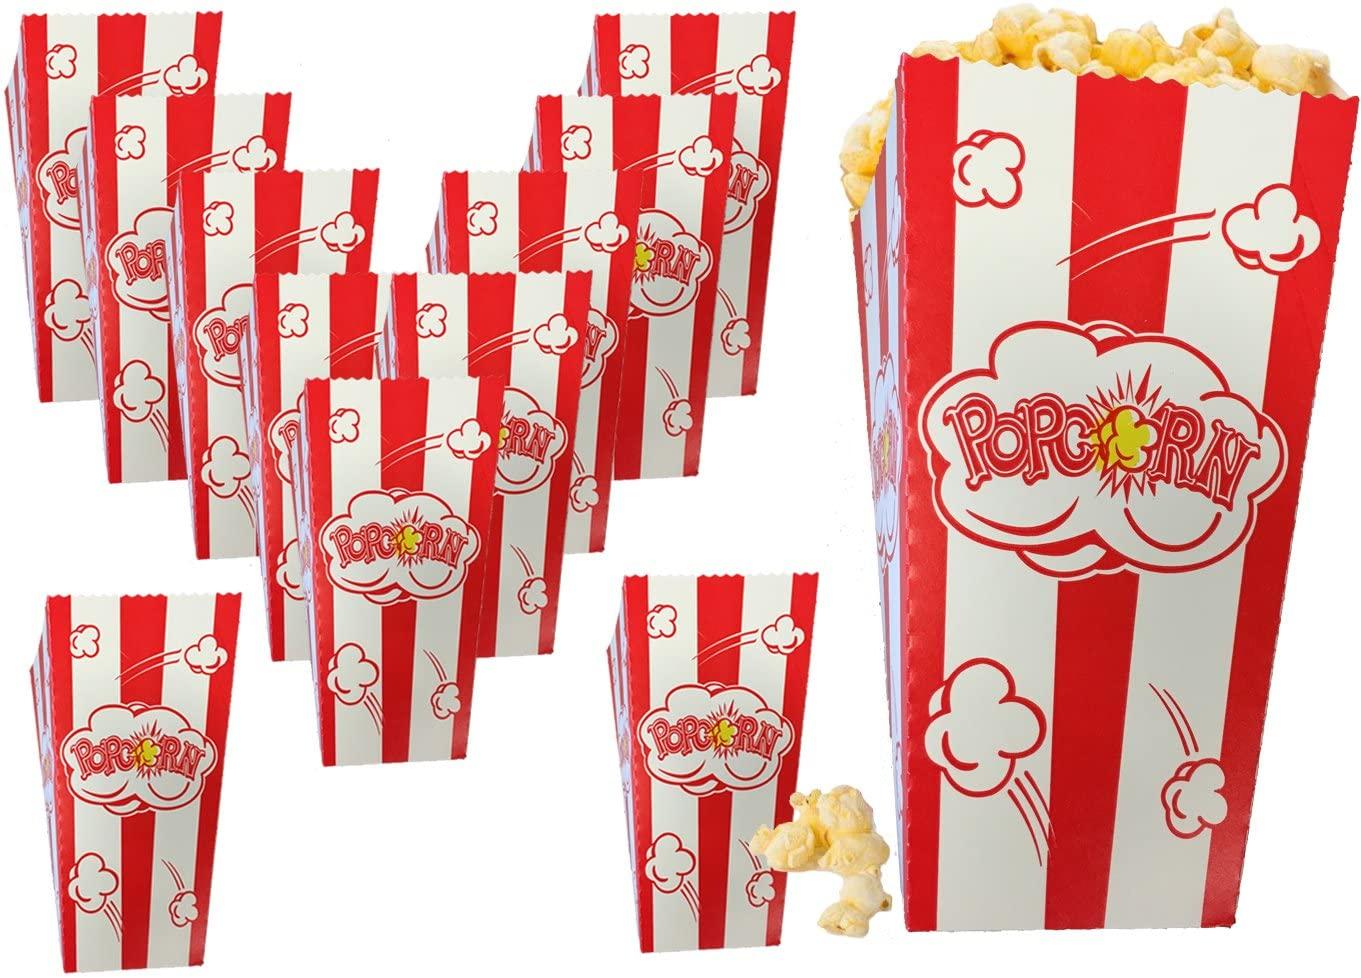 Popcorn Box Small Fresh PopCorn Logo Red White Stripe Classic Party Snack Favor Fun Sized .79 oz Classic style Box (25)